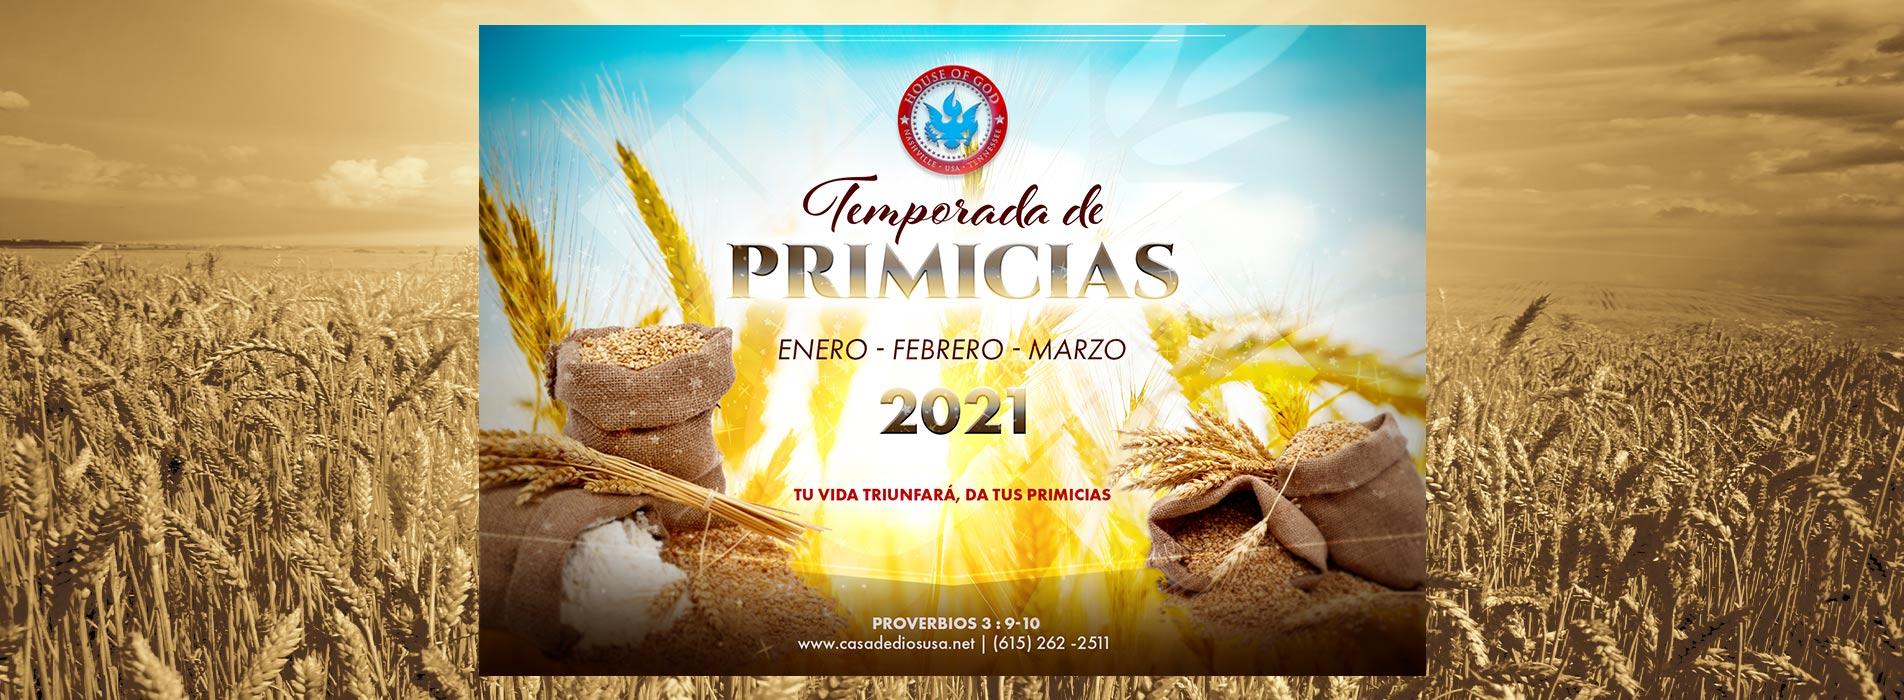 Slider-Primicias2021